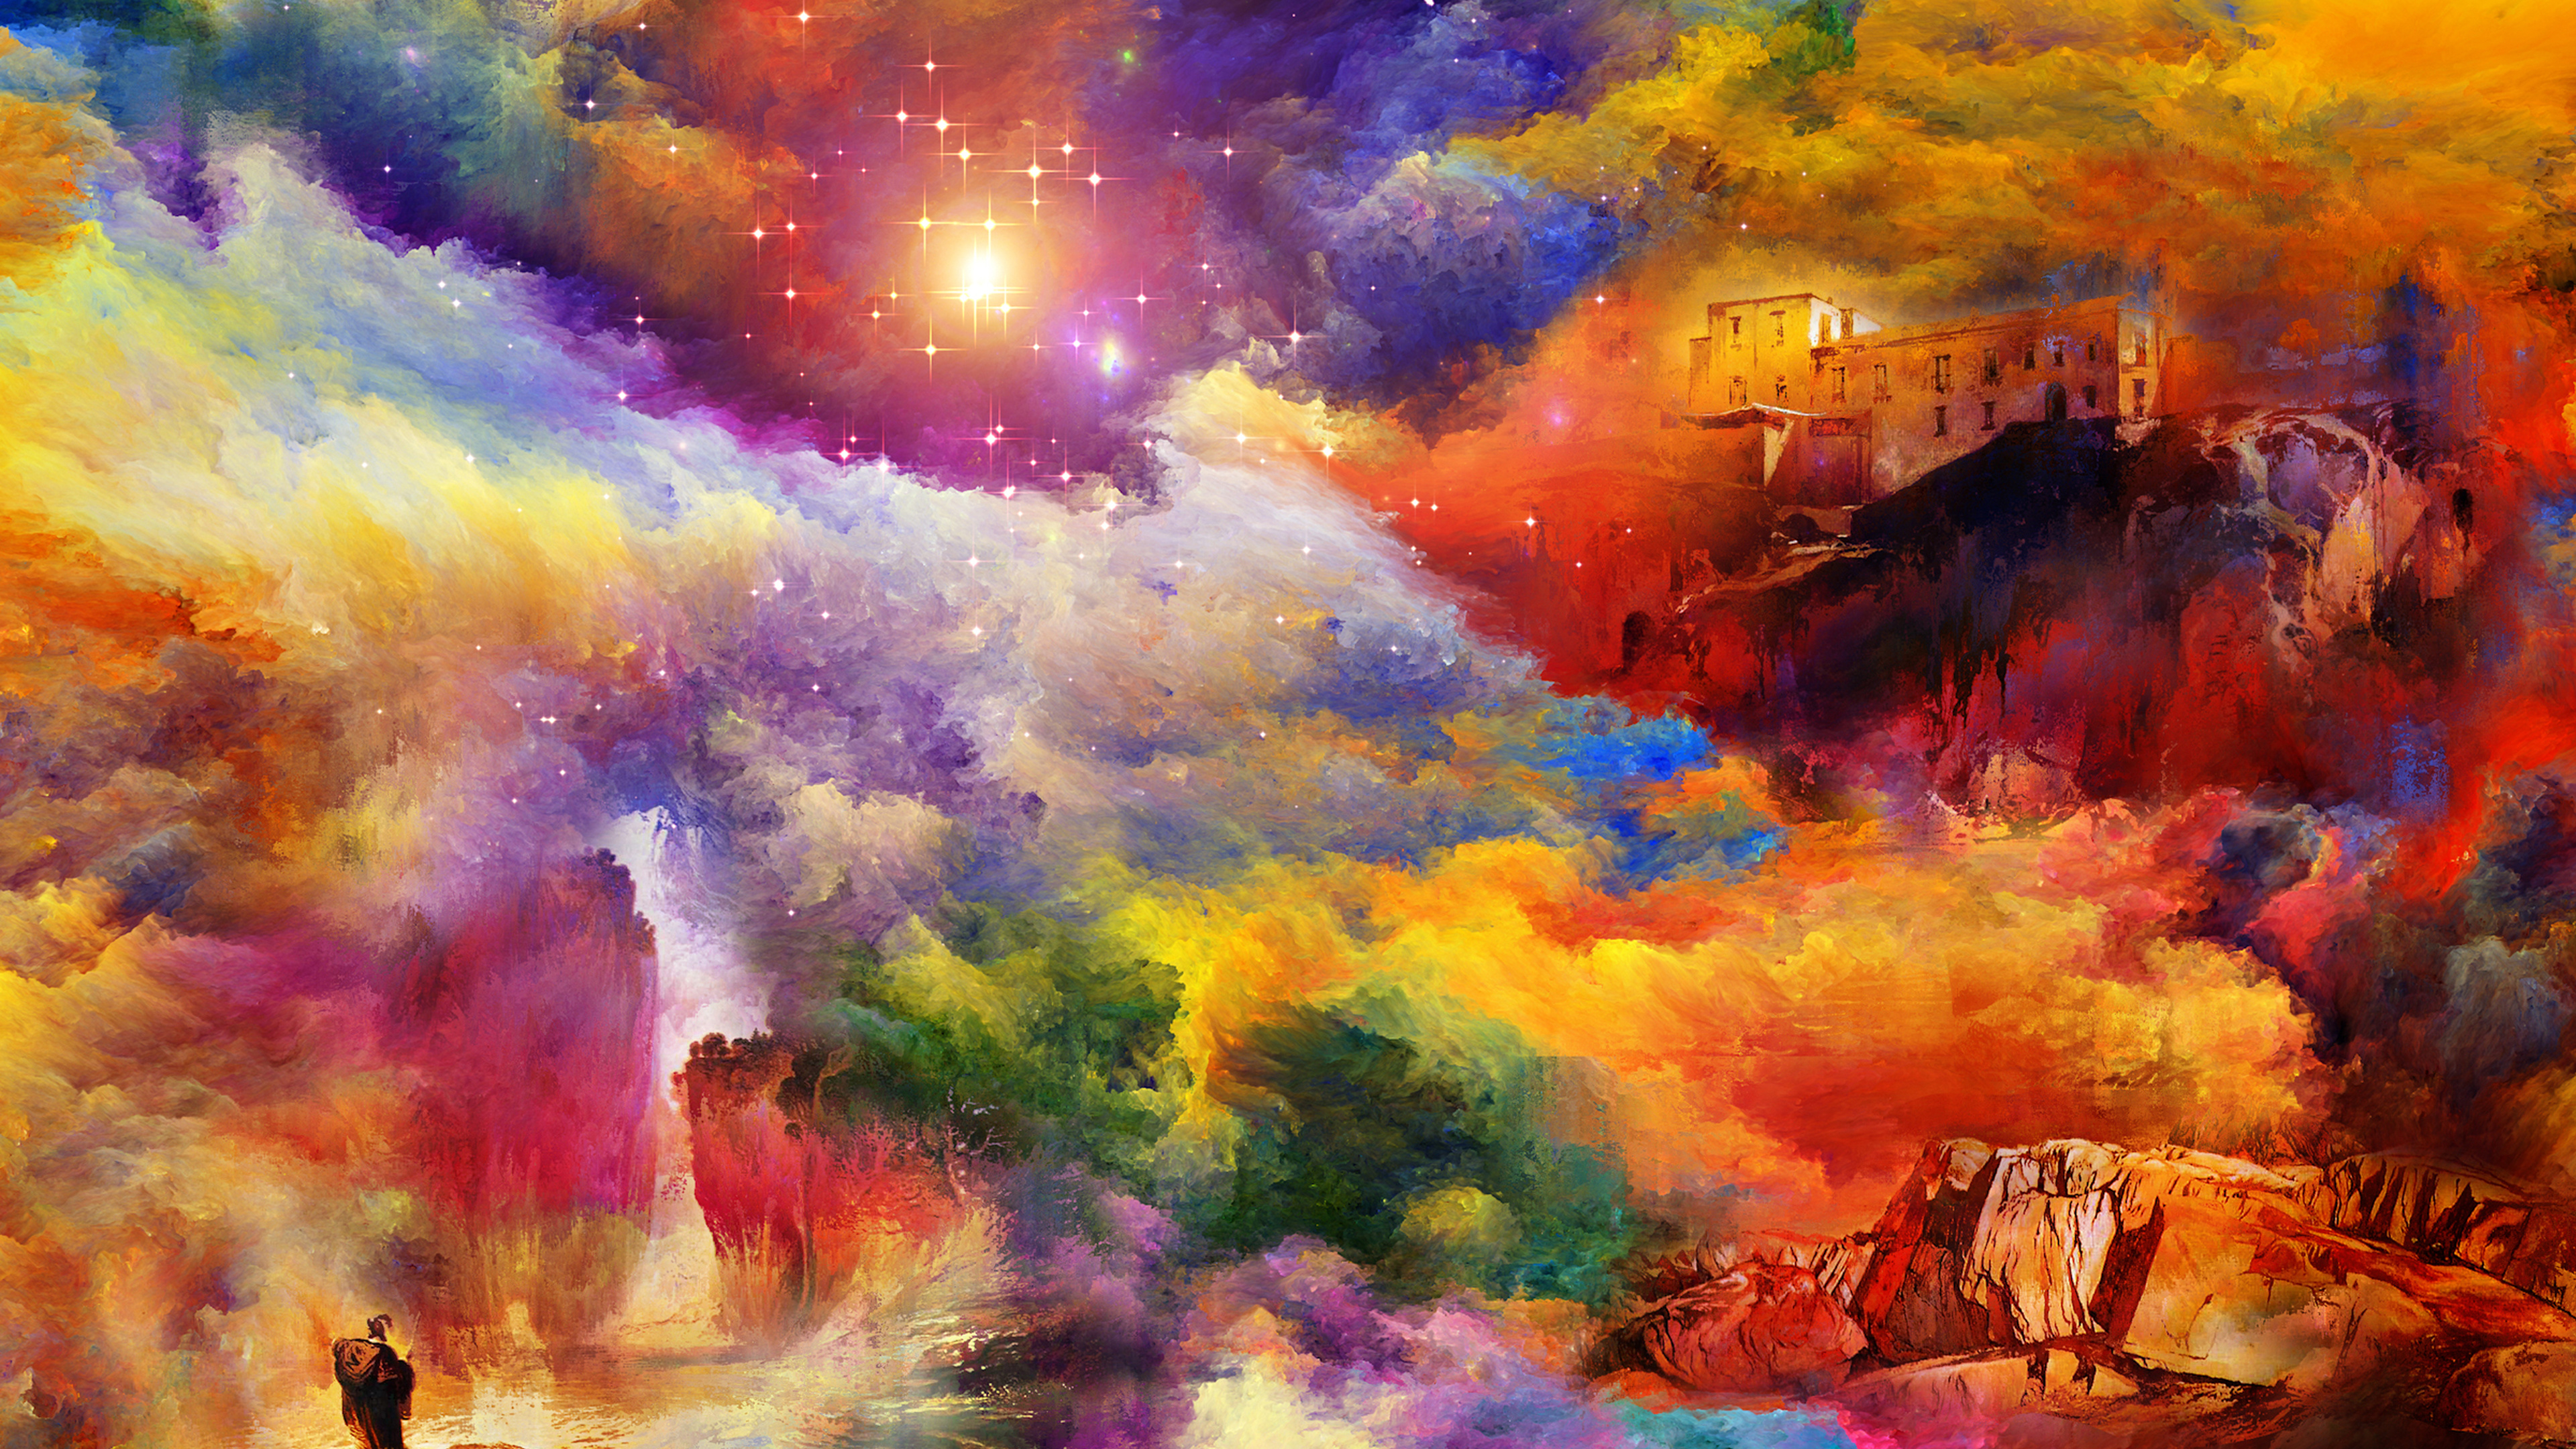 Fantasy Scenery 4k Hd Desktop Wallpaper For 4k Ultra Hd Tv: Fantasy Landscape 4k Ultra HD Wallpaper